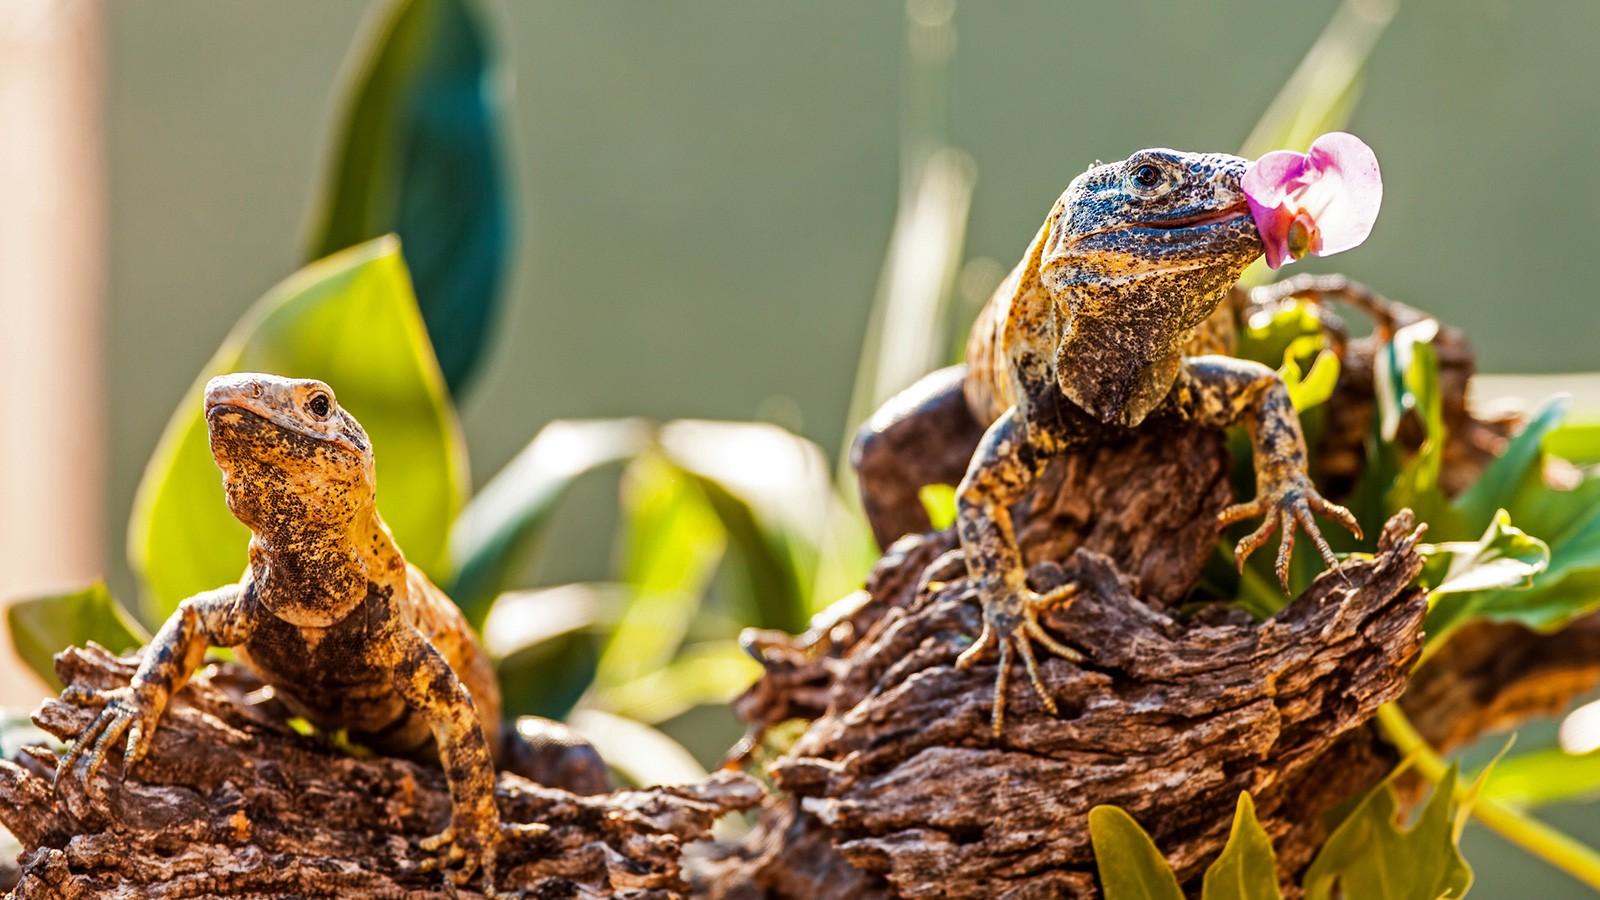 Herbivore Examples: Common Plant-Eating Animals